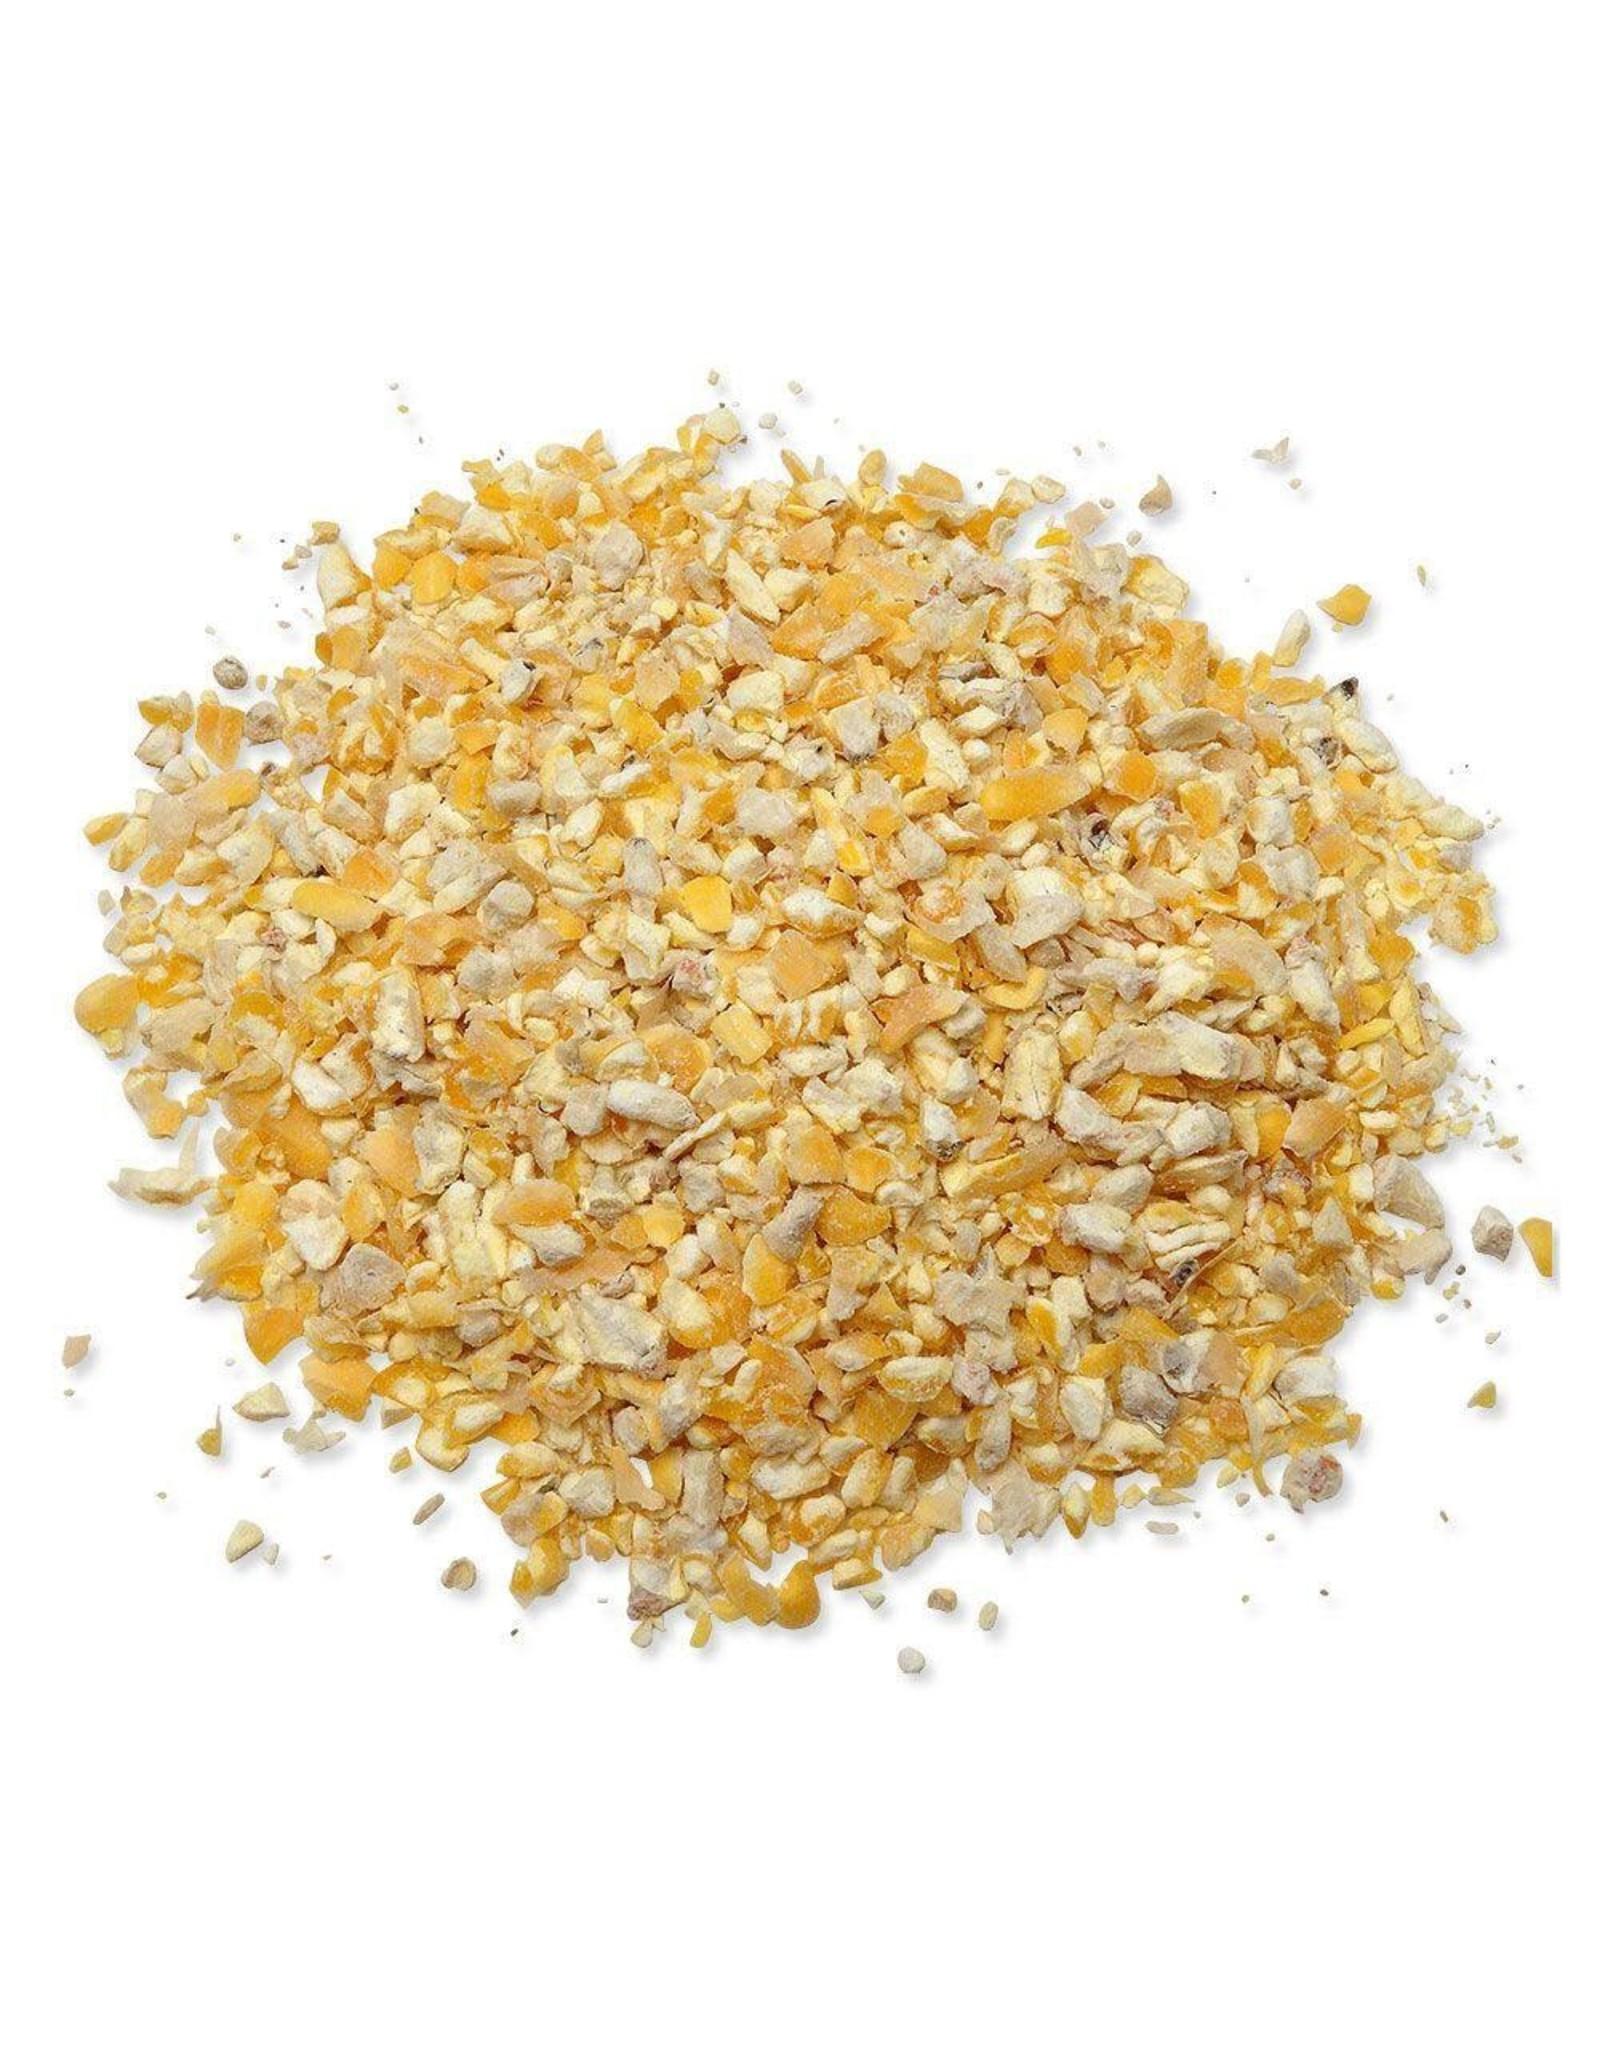 Syfrett Cracked Corn